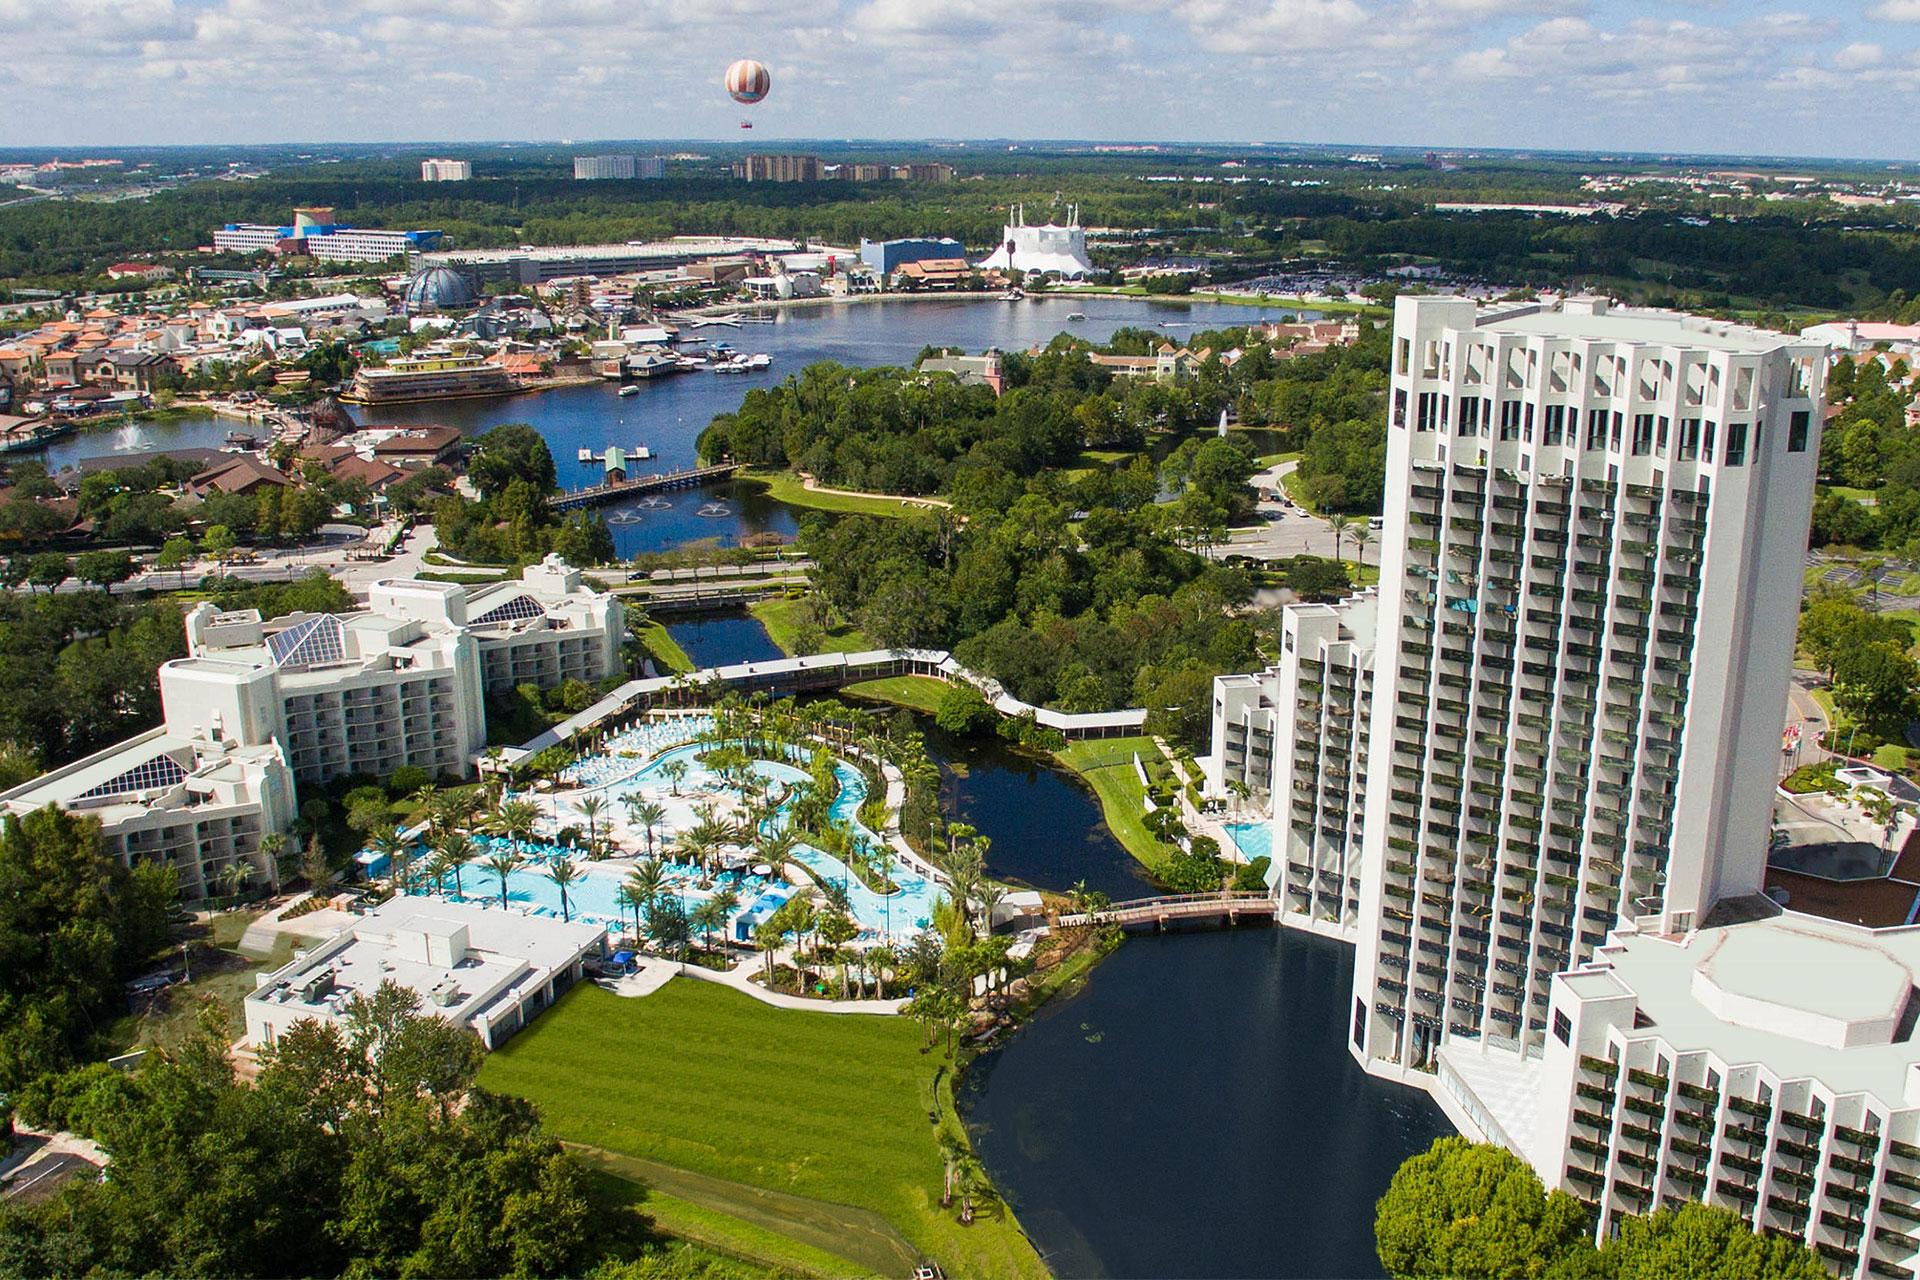 Aerial View of Hilton Orlando Buena Vista Palace; Courtesy of Hilton Orlando Buena Vista Palace